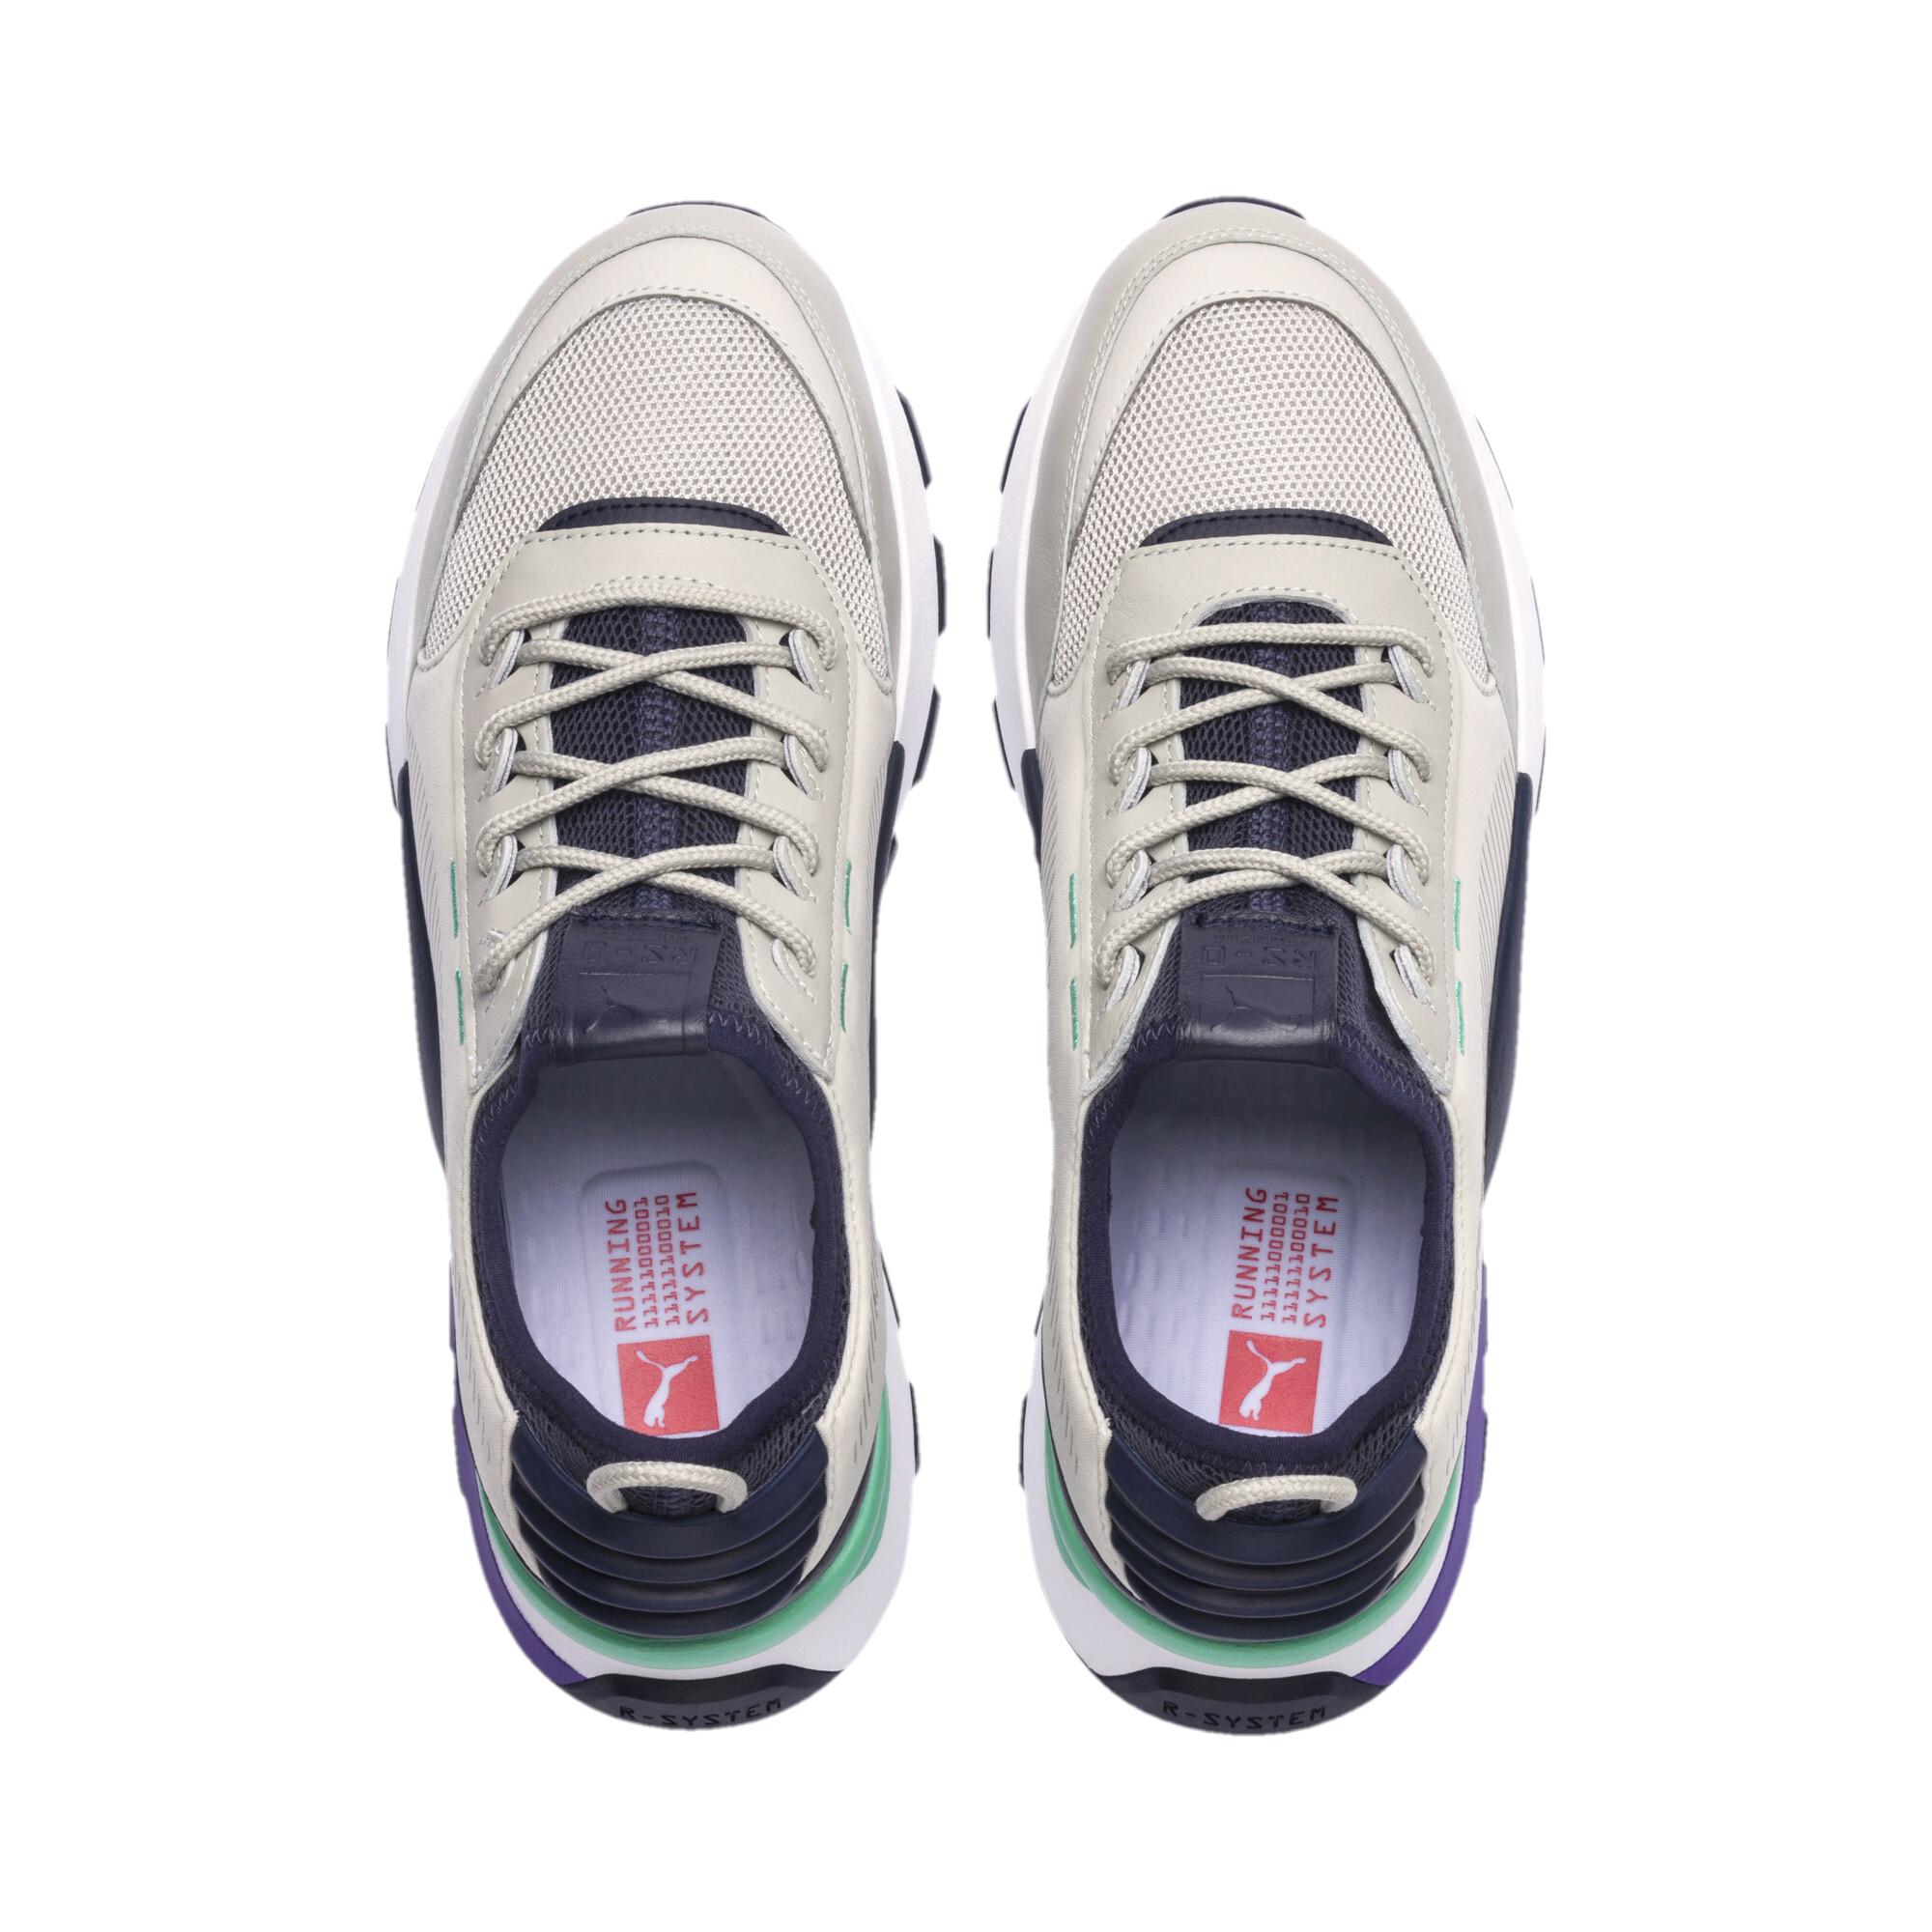 PUMA-RS-0-Tracks-Unisex-Shoe-Evolution thumbnail 8